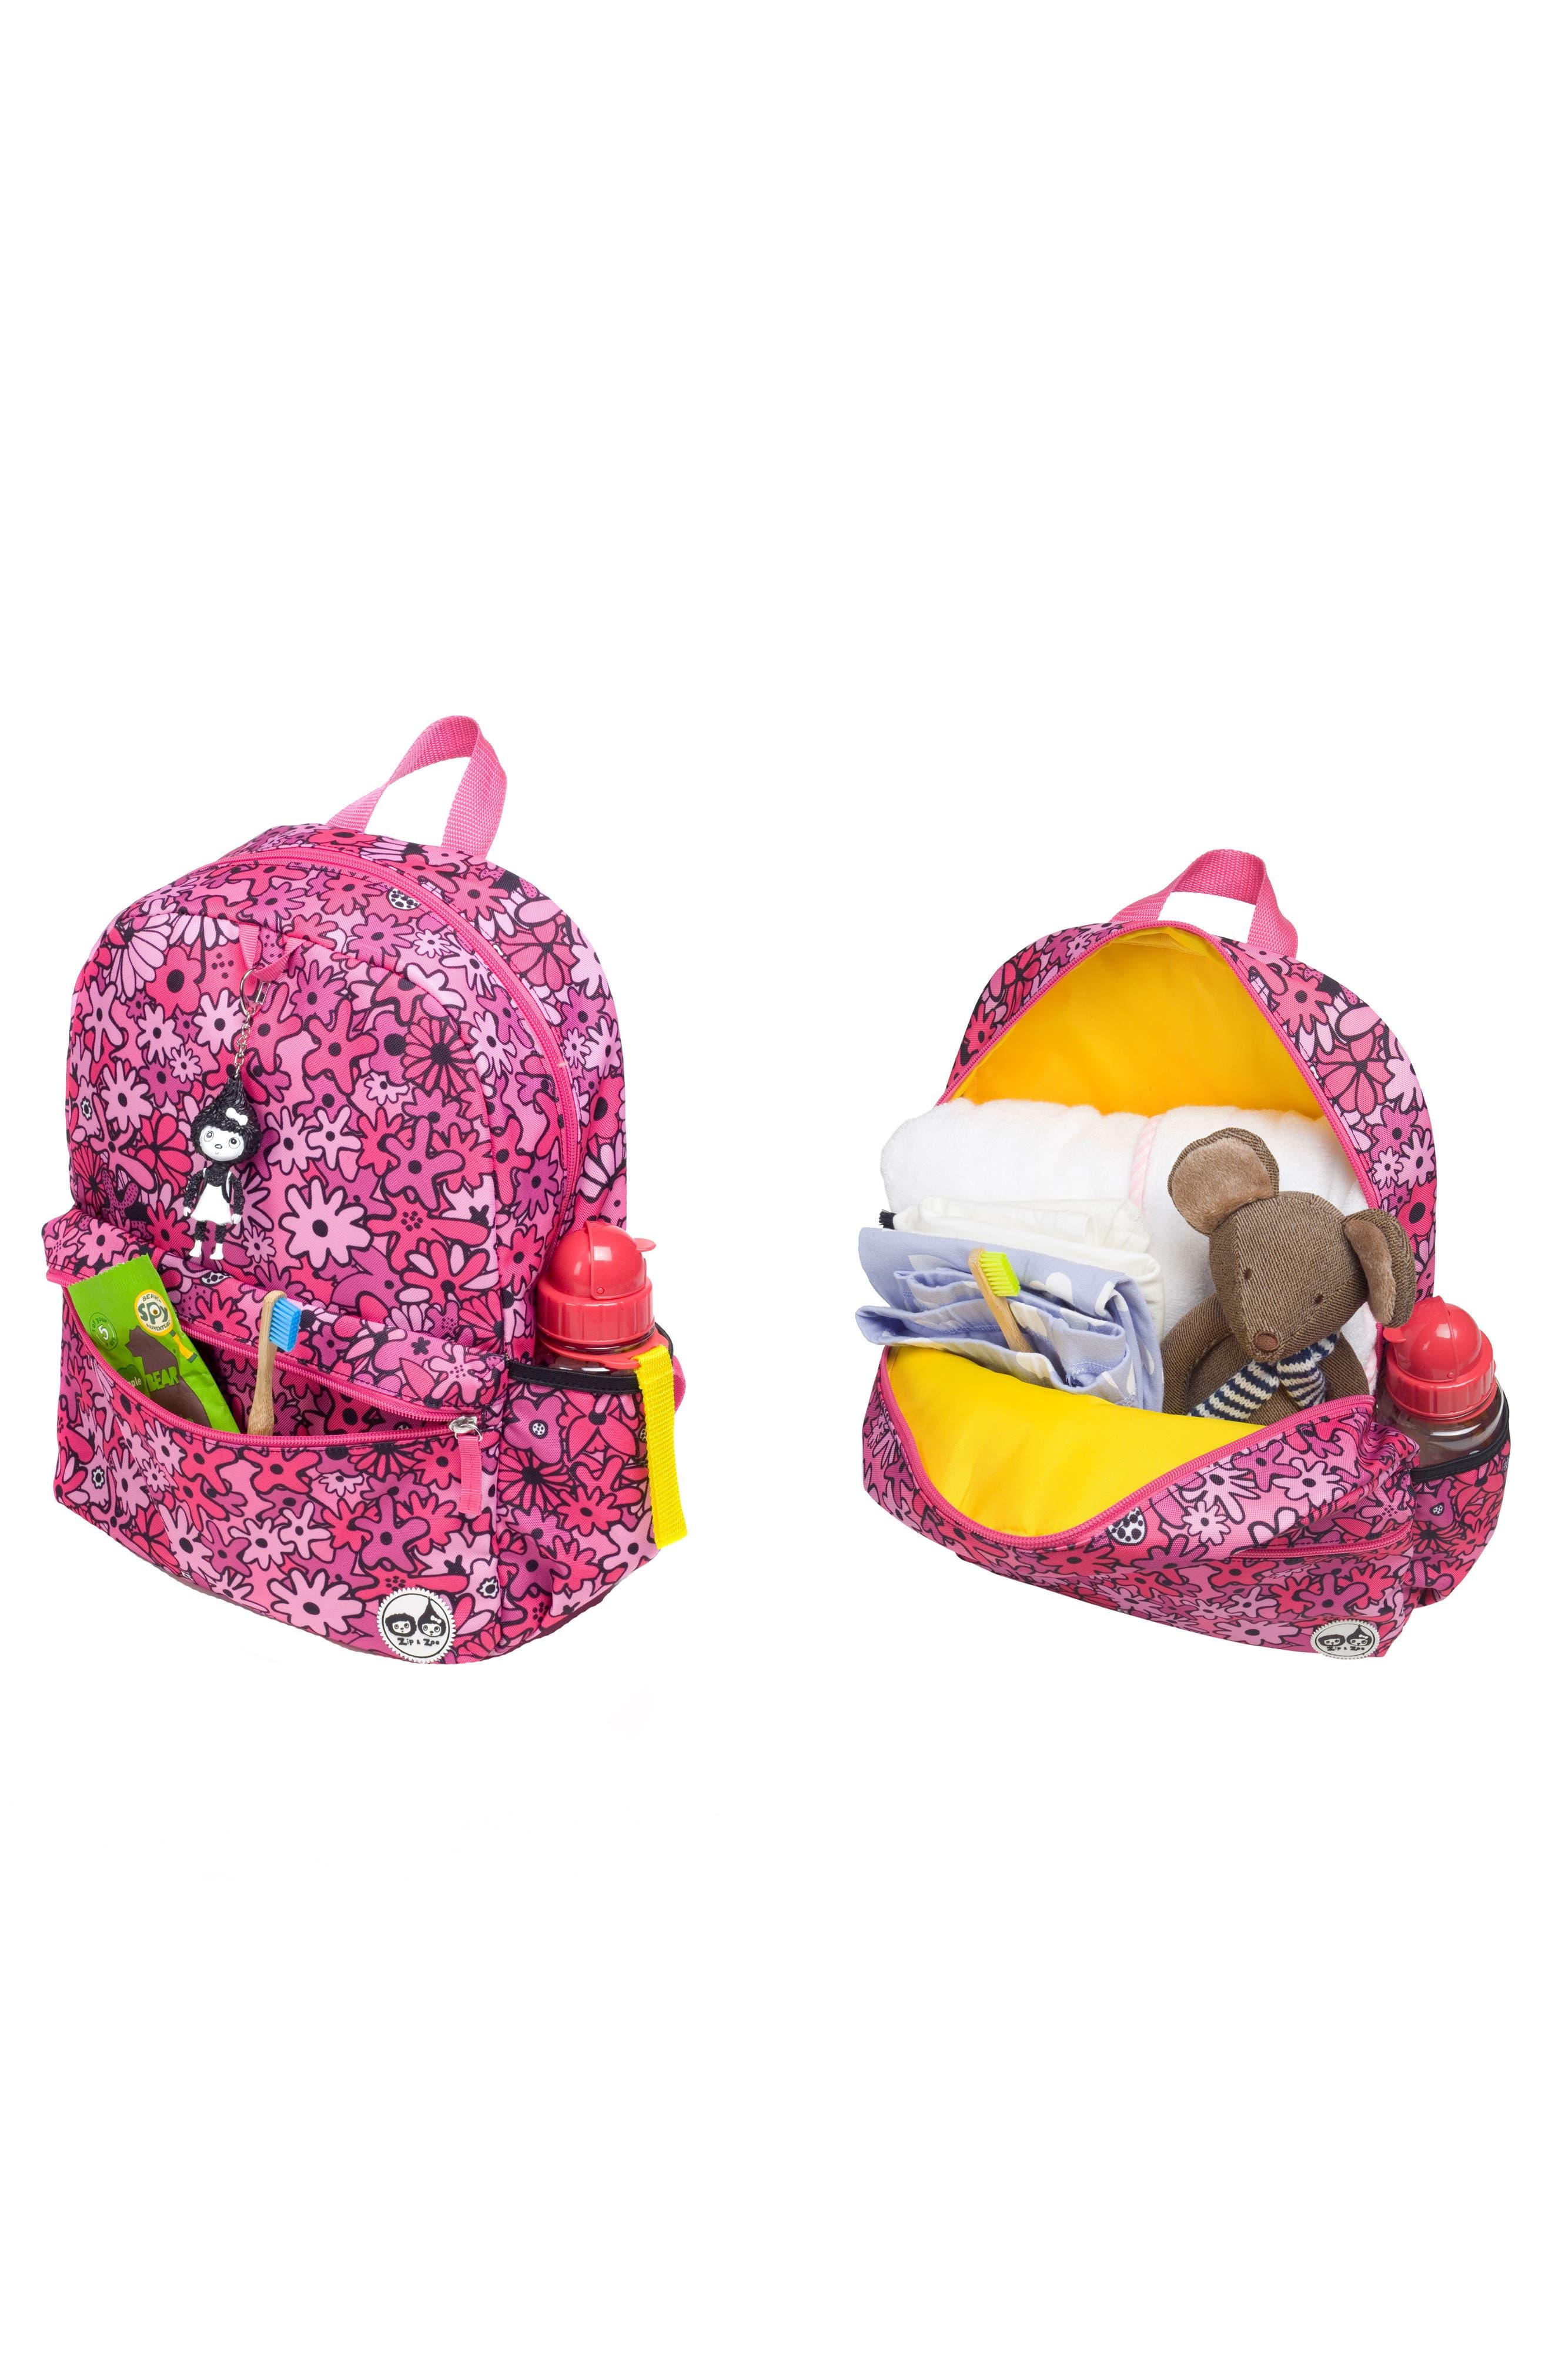 Zip & Zoe Floral Junior Backpack,                             Alternate thumbnail 7, color,                             FLORAL PINK